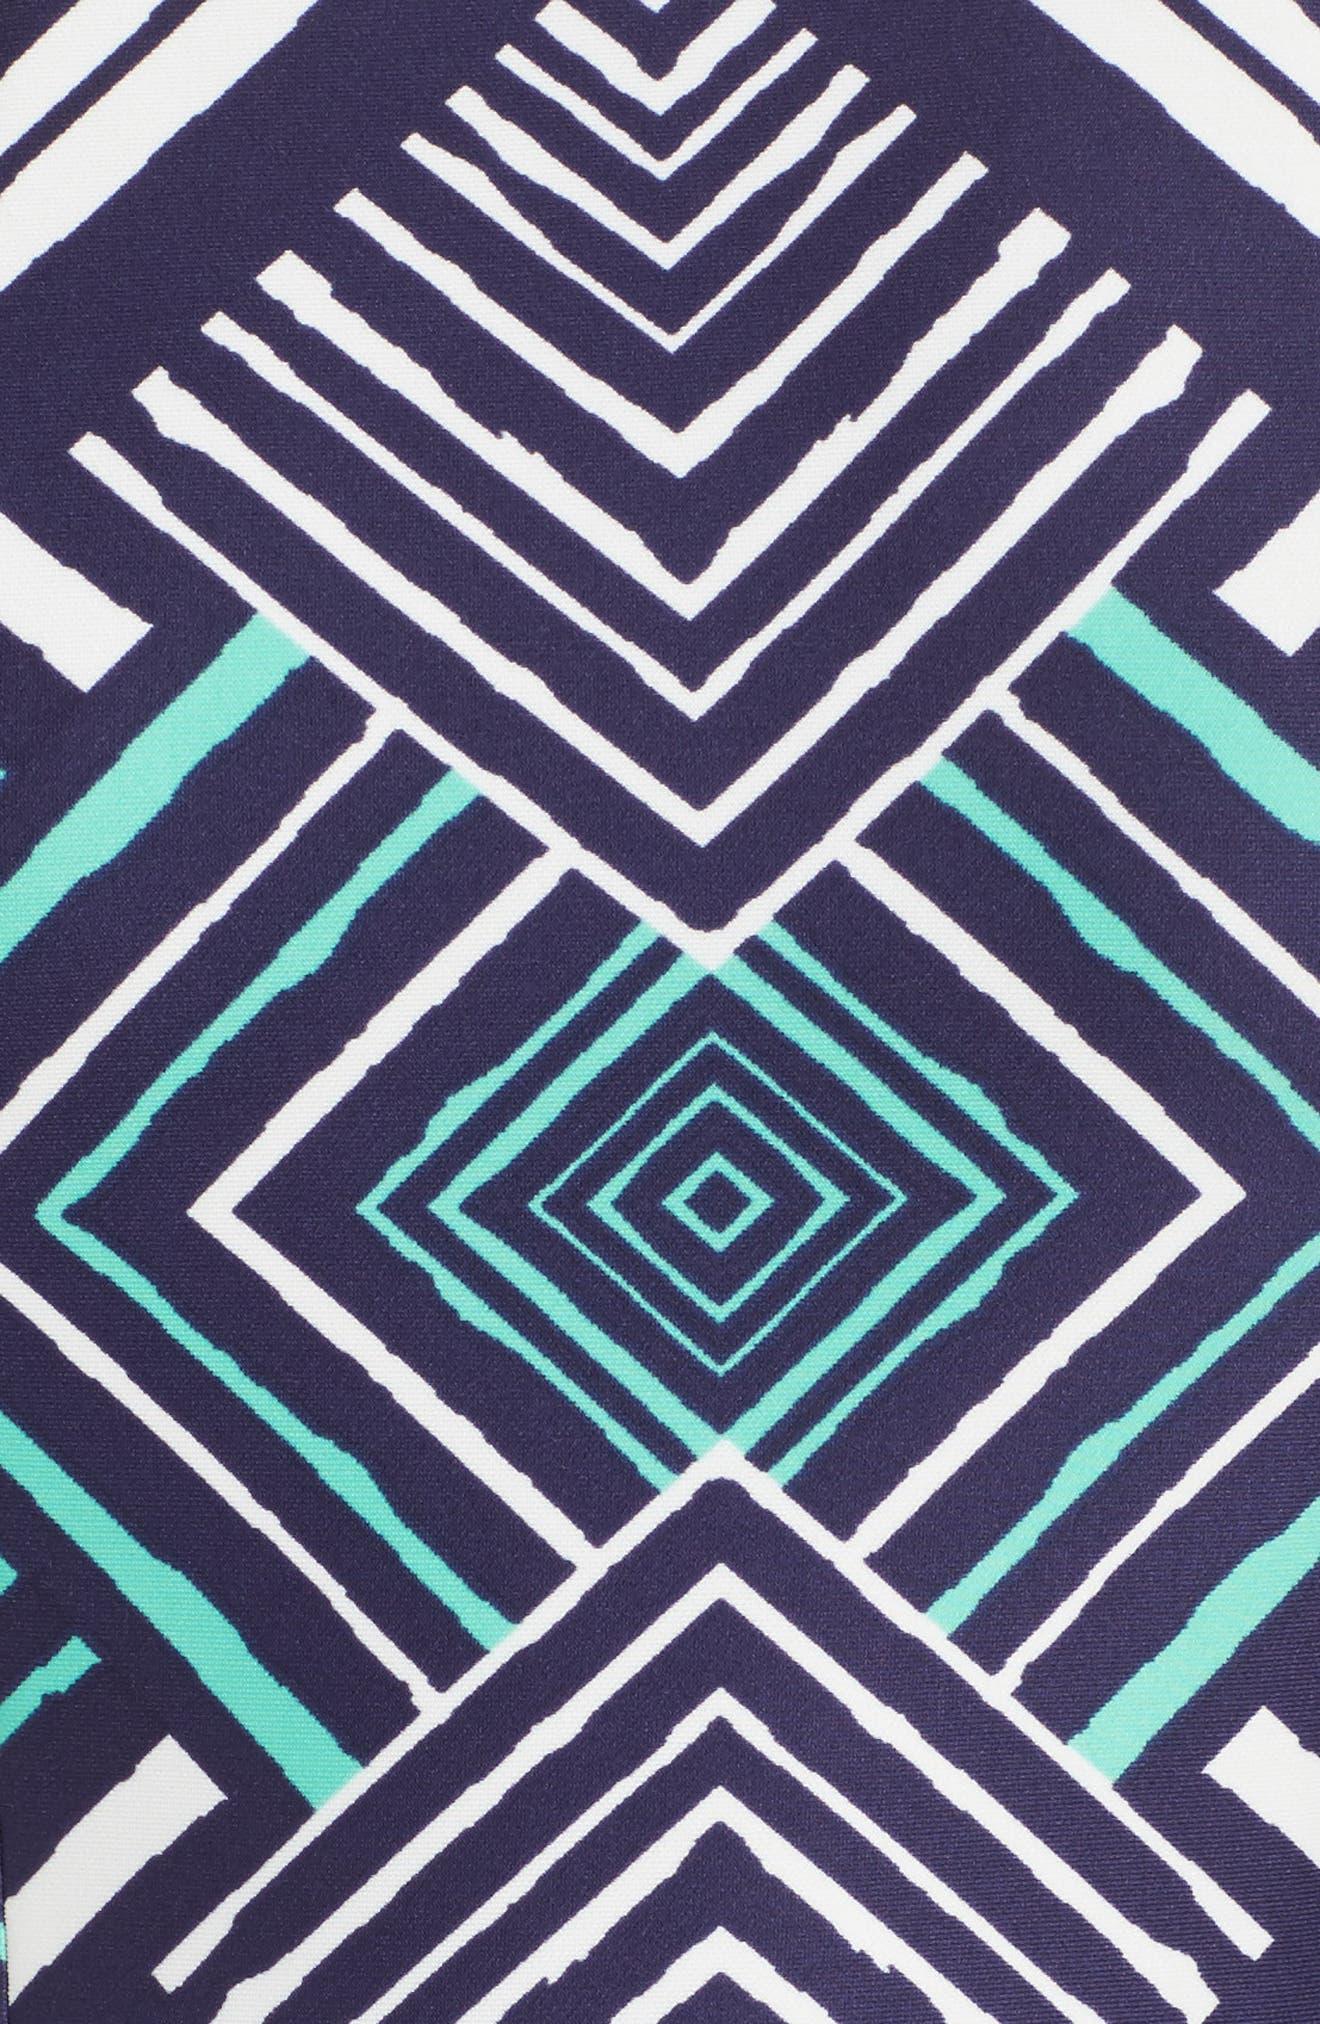 Fit & Flare Dress,                             Alternate thumbnail 5, color,                             Navy/ Multi